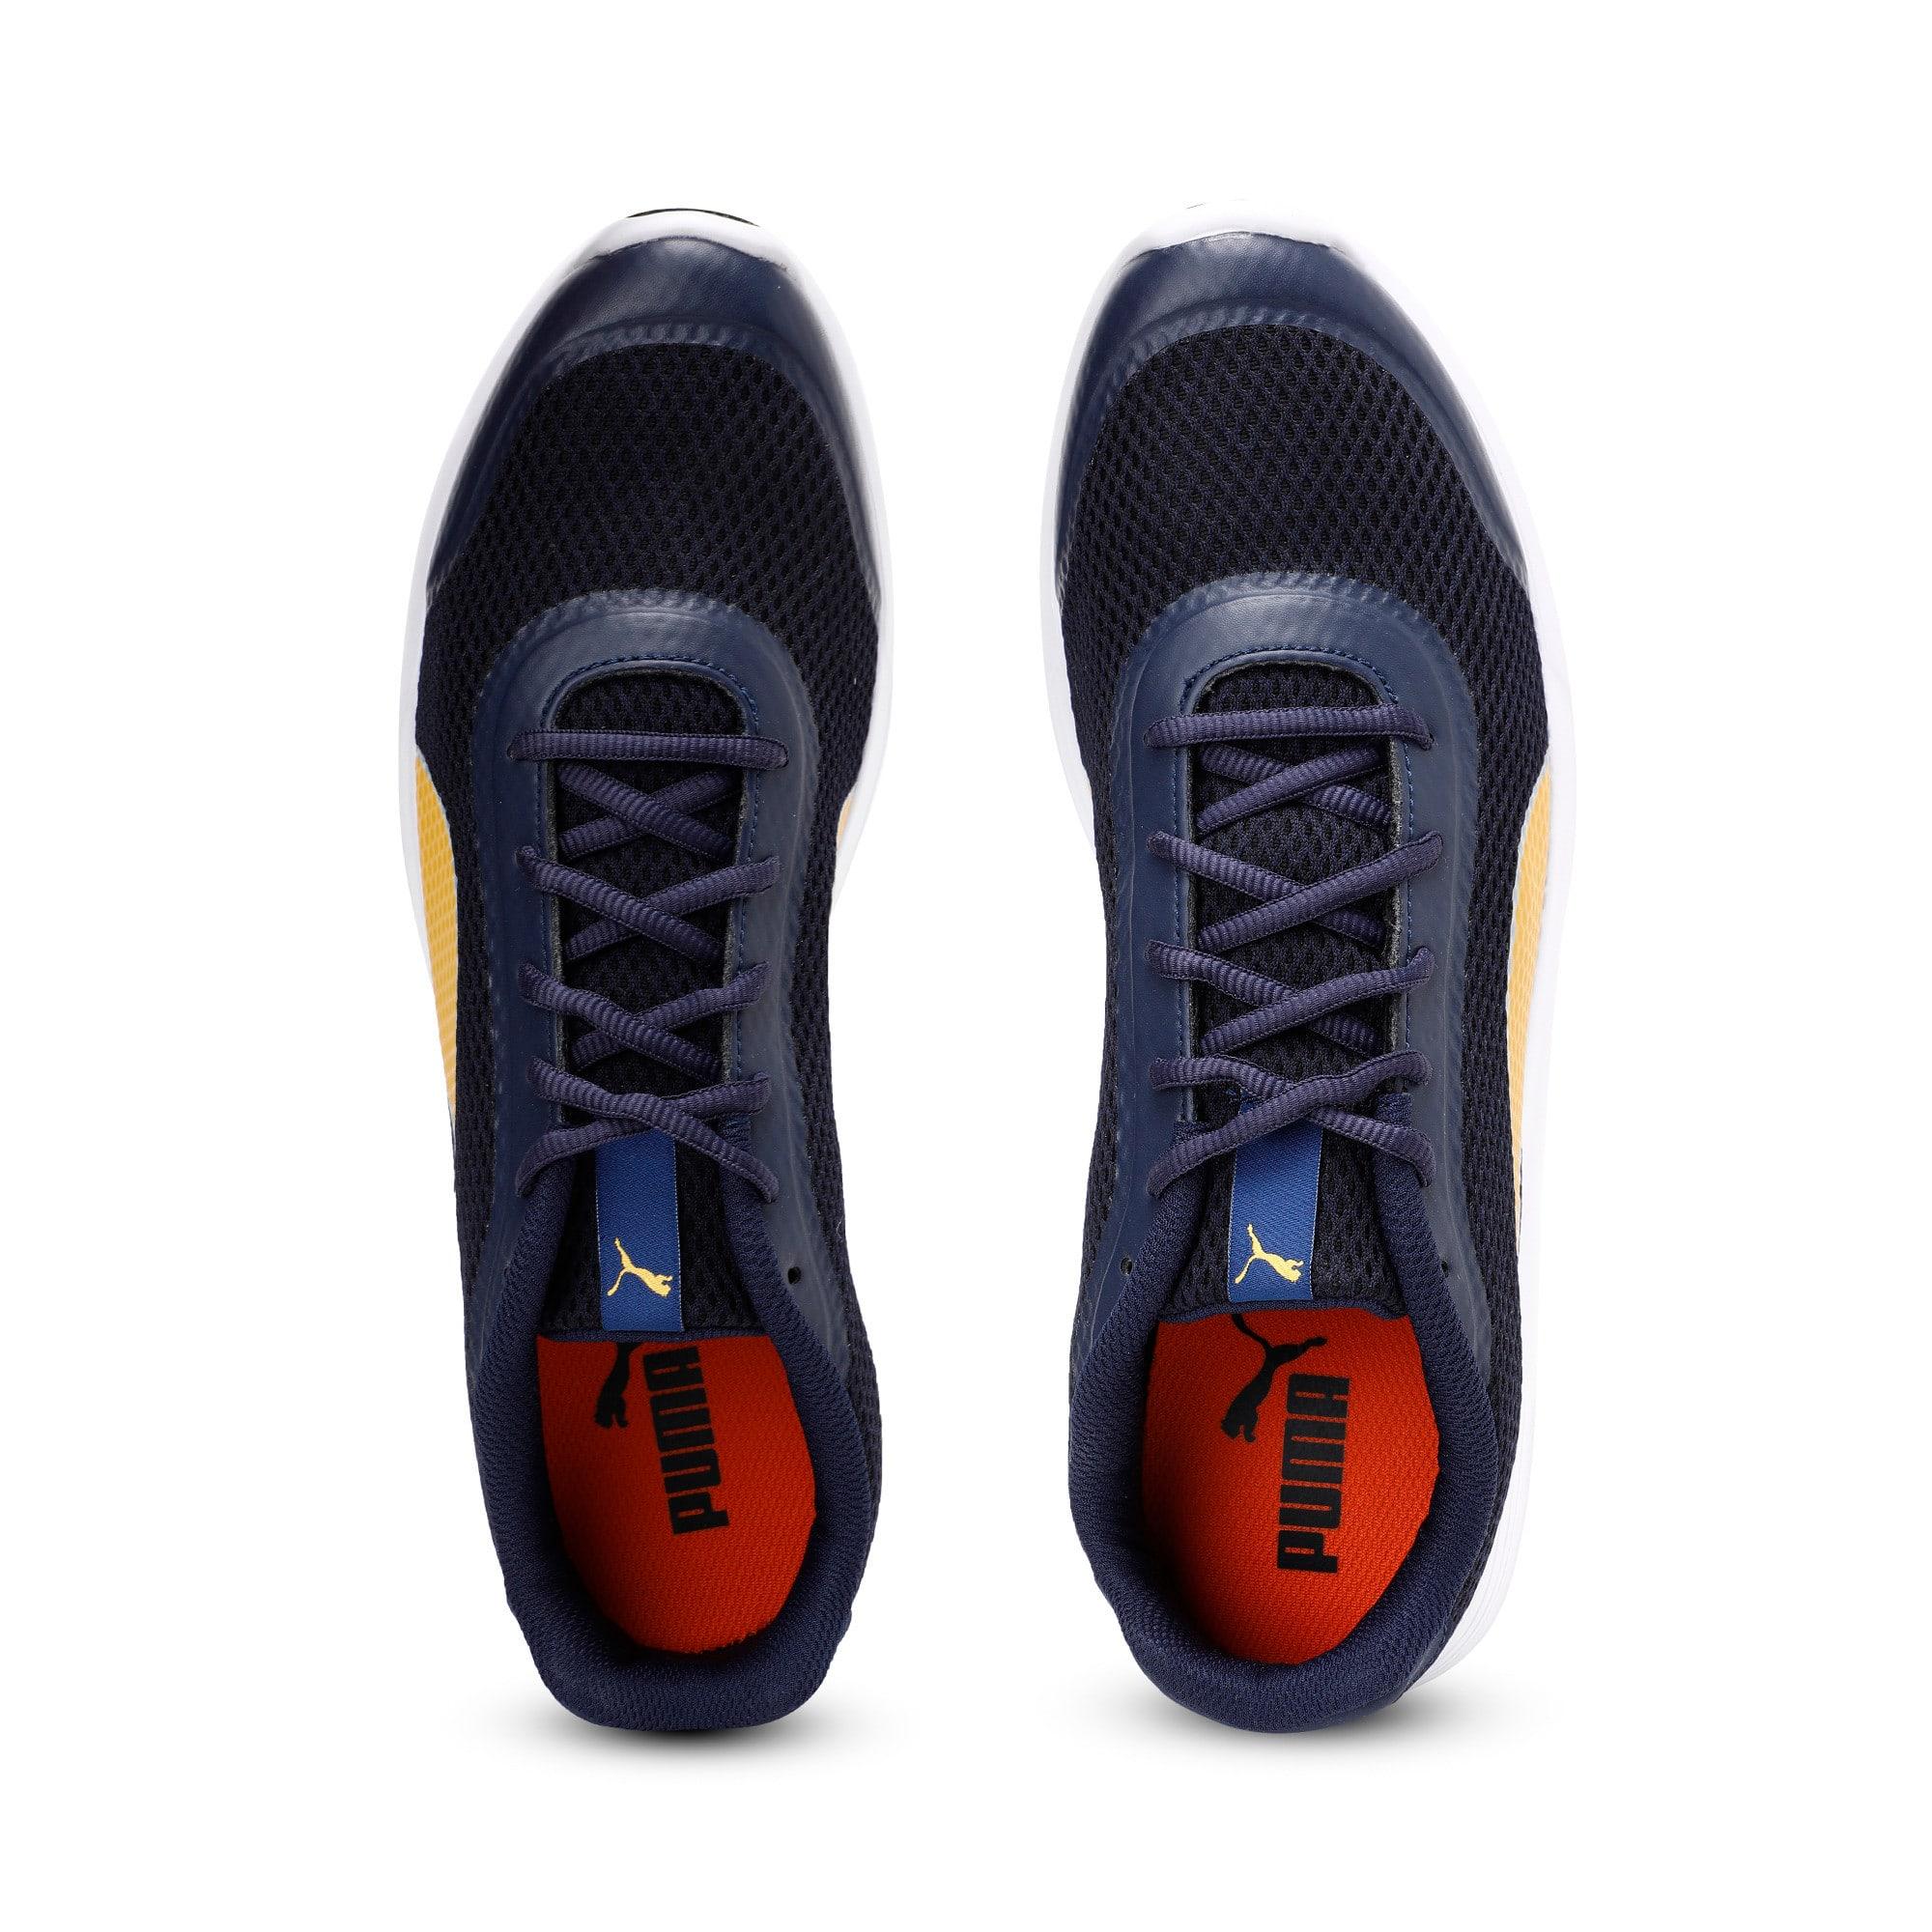 Thumbnail 6 of FST Runner v2 IDP Men's Sportstyle Shoes, Dark Shadow-Silver-Quarry, medium-IND